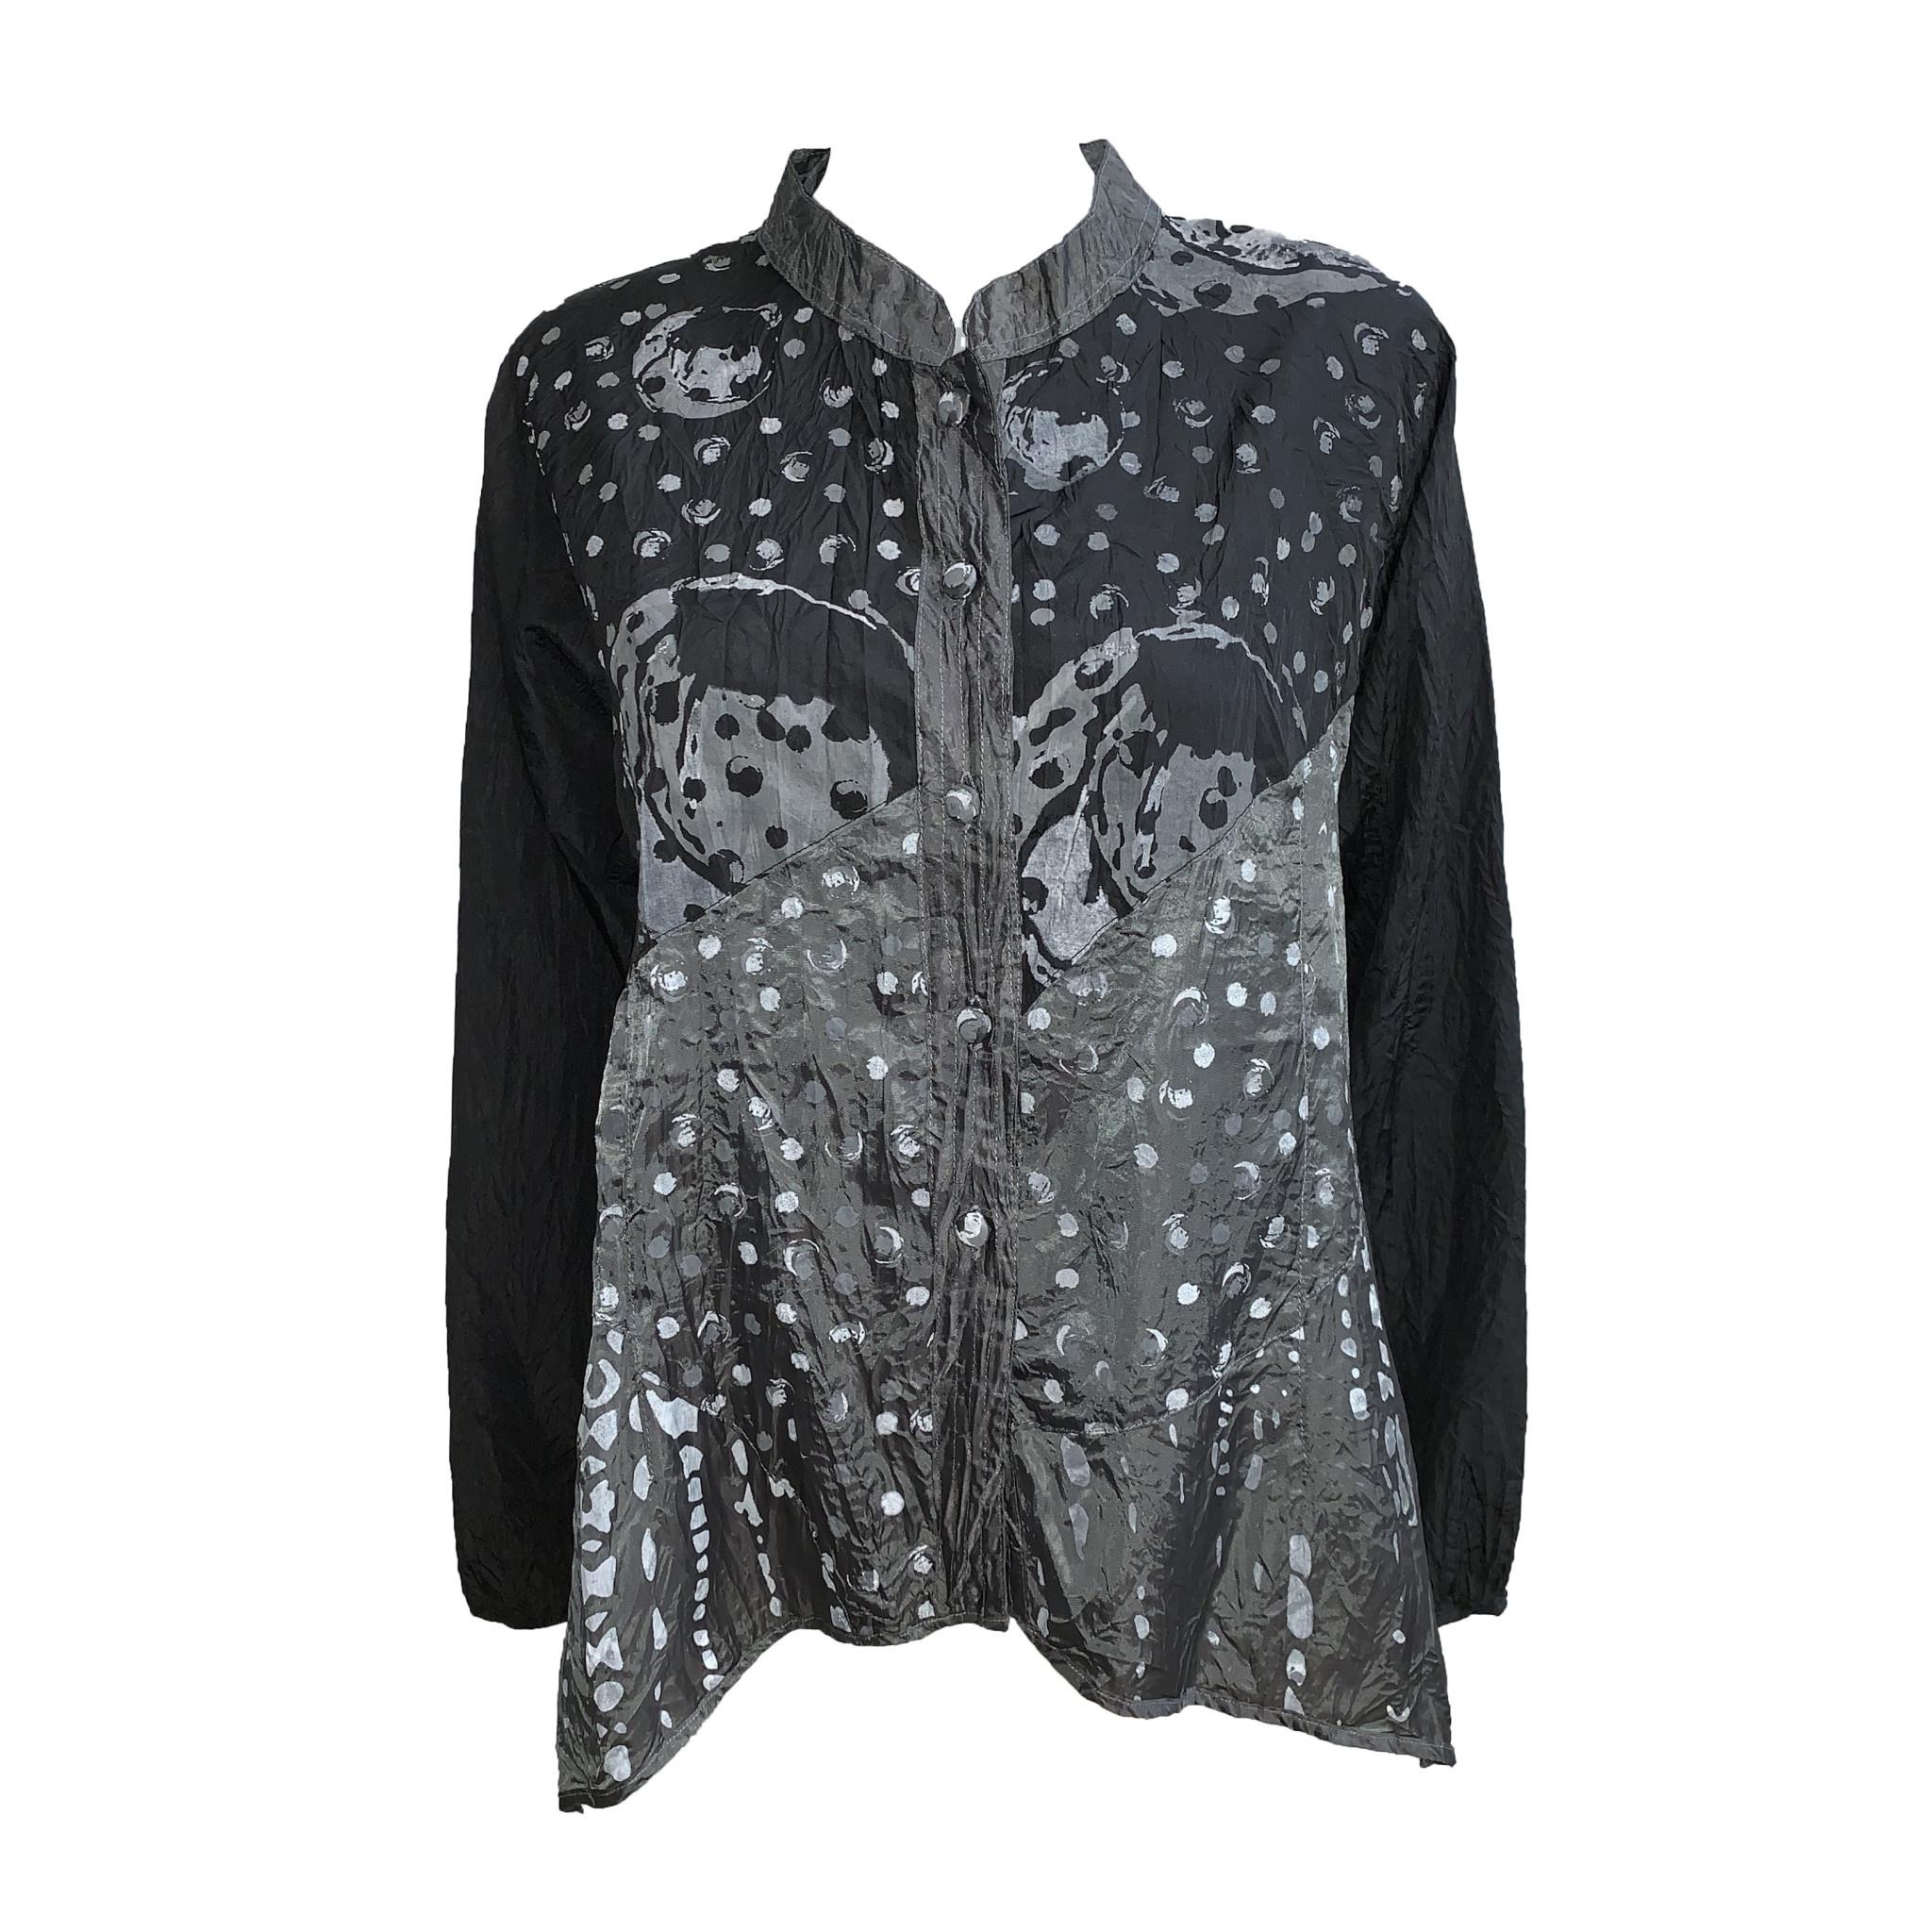 Harubella Harubella Short Mandarin Buttoned Jacket - Black Print